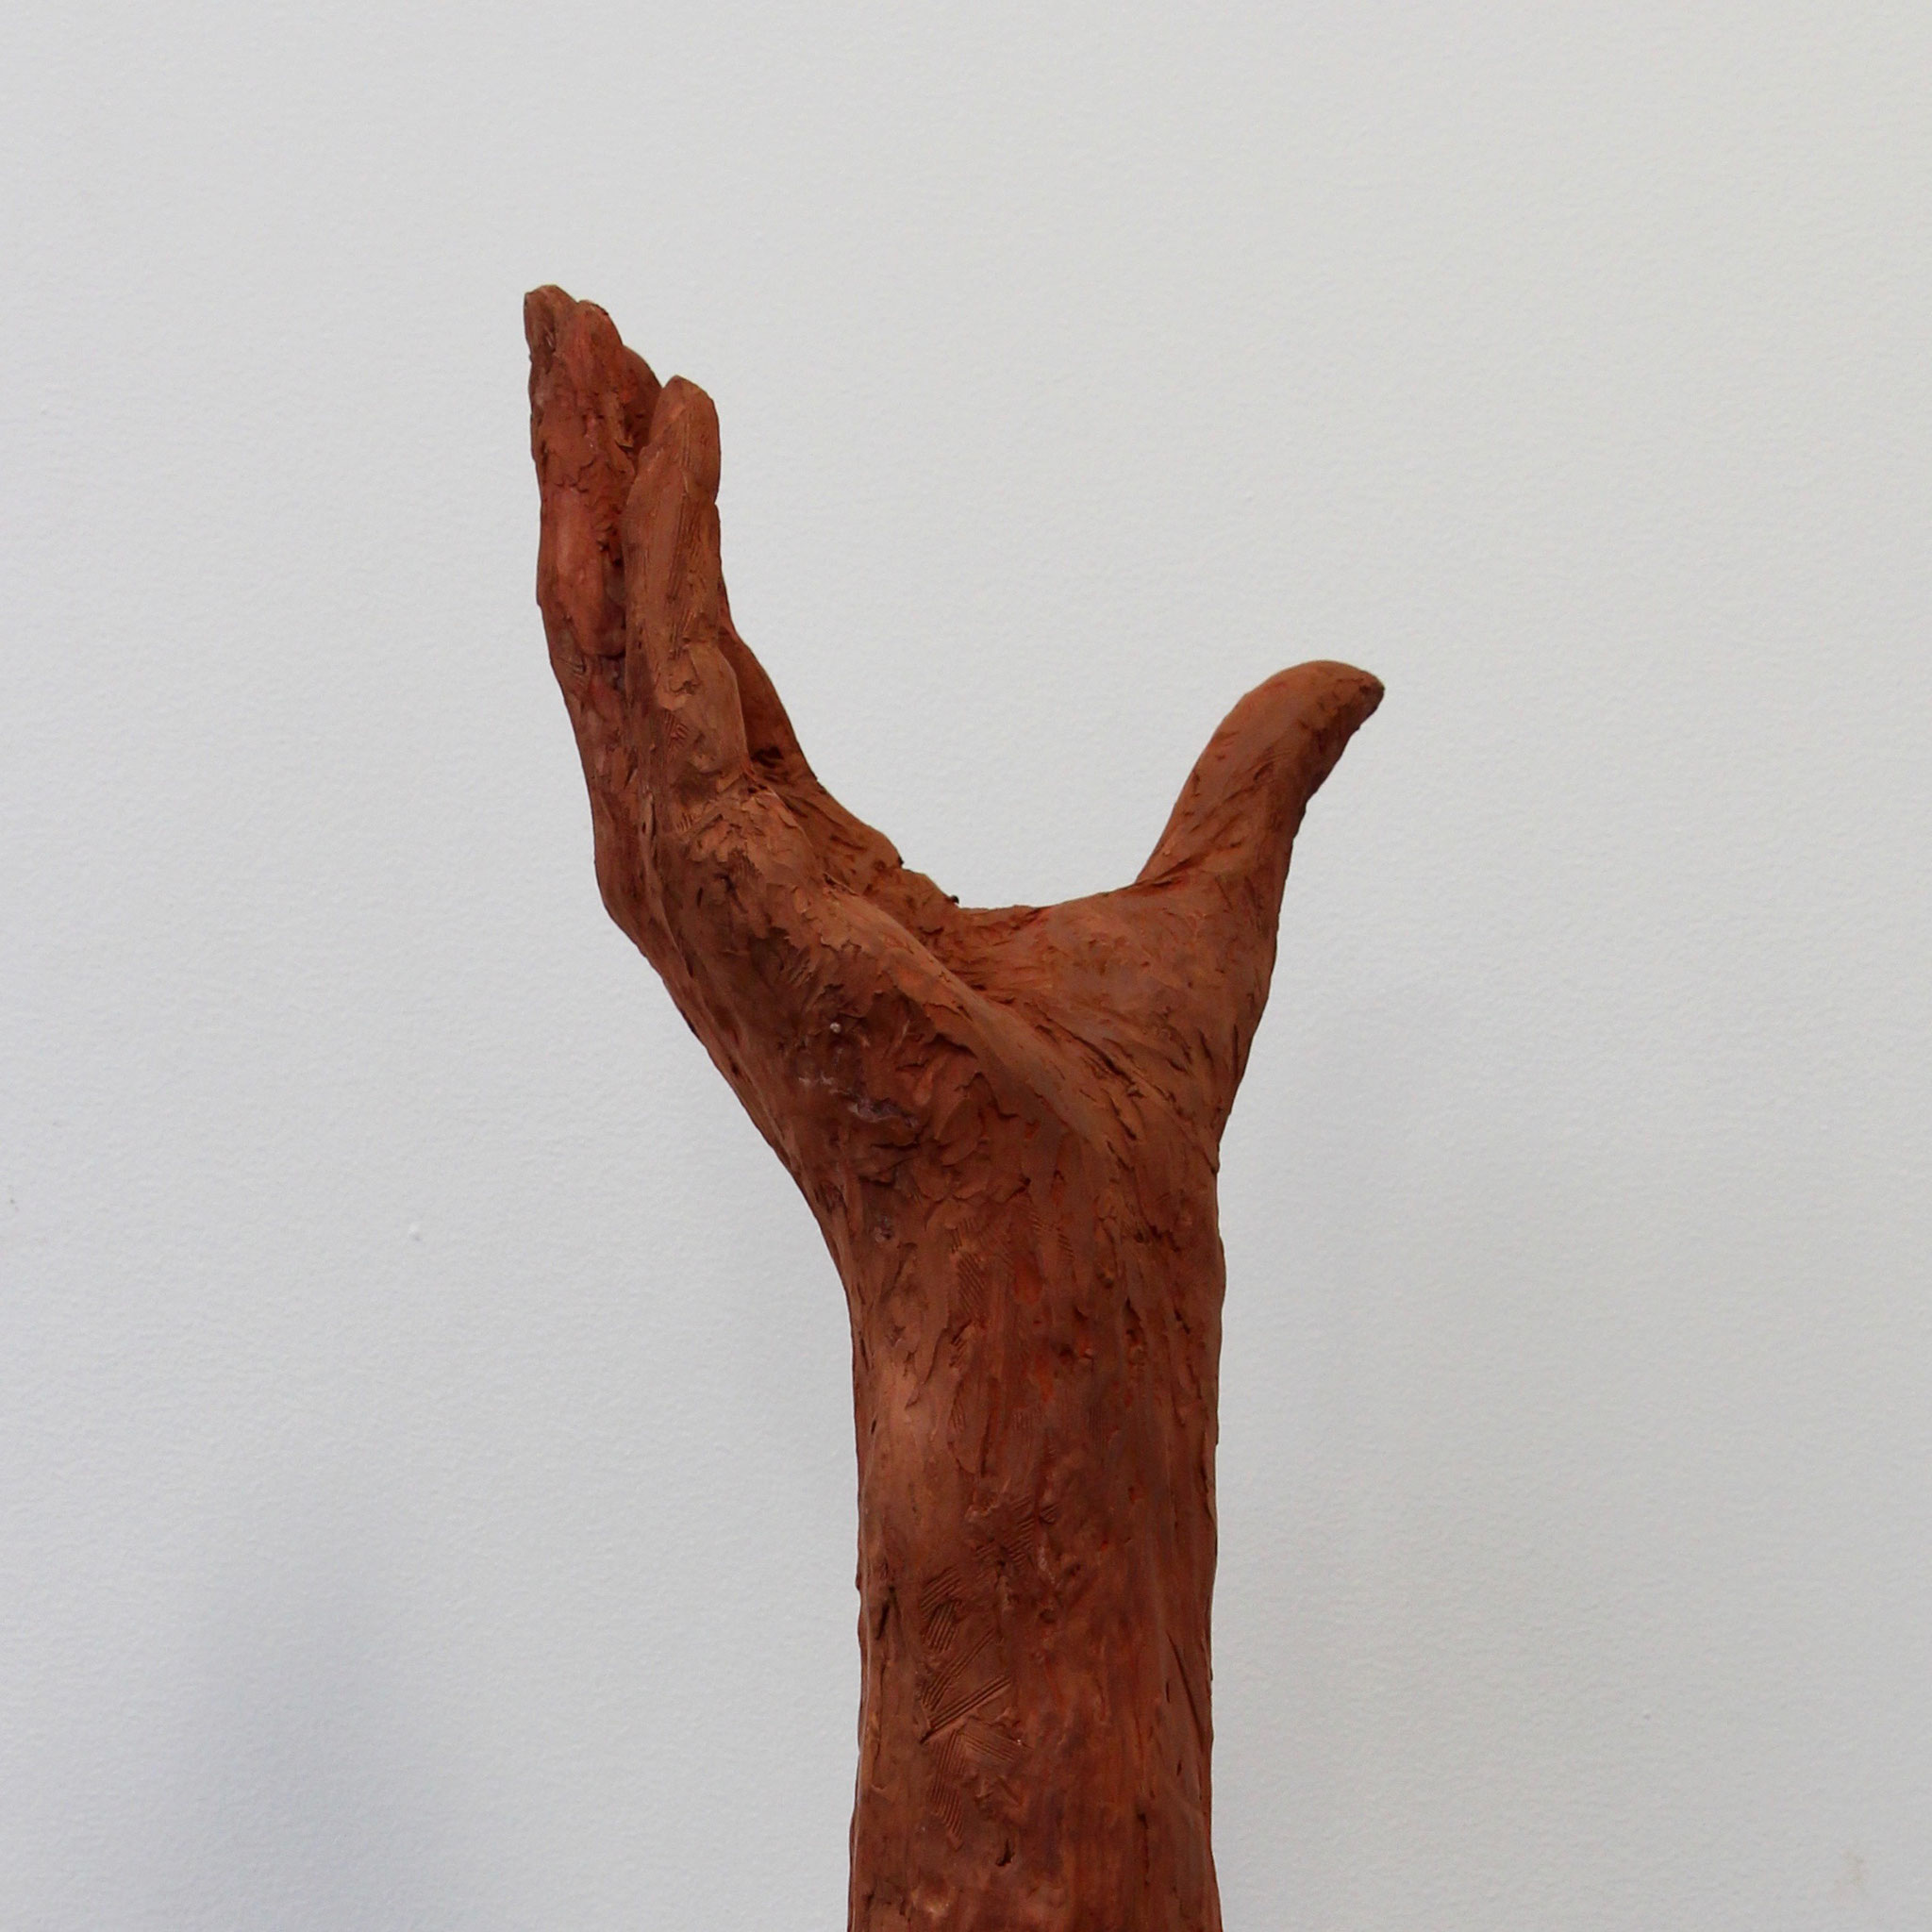 Sculpture Main 002 - Sébastien Langloÿs